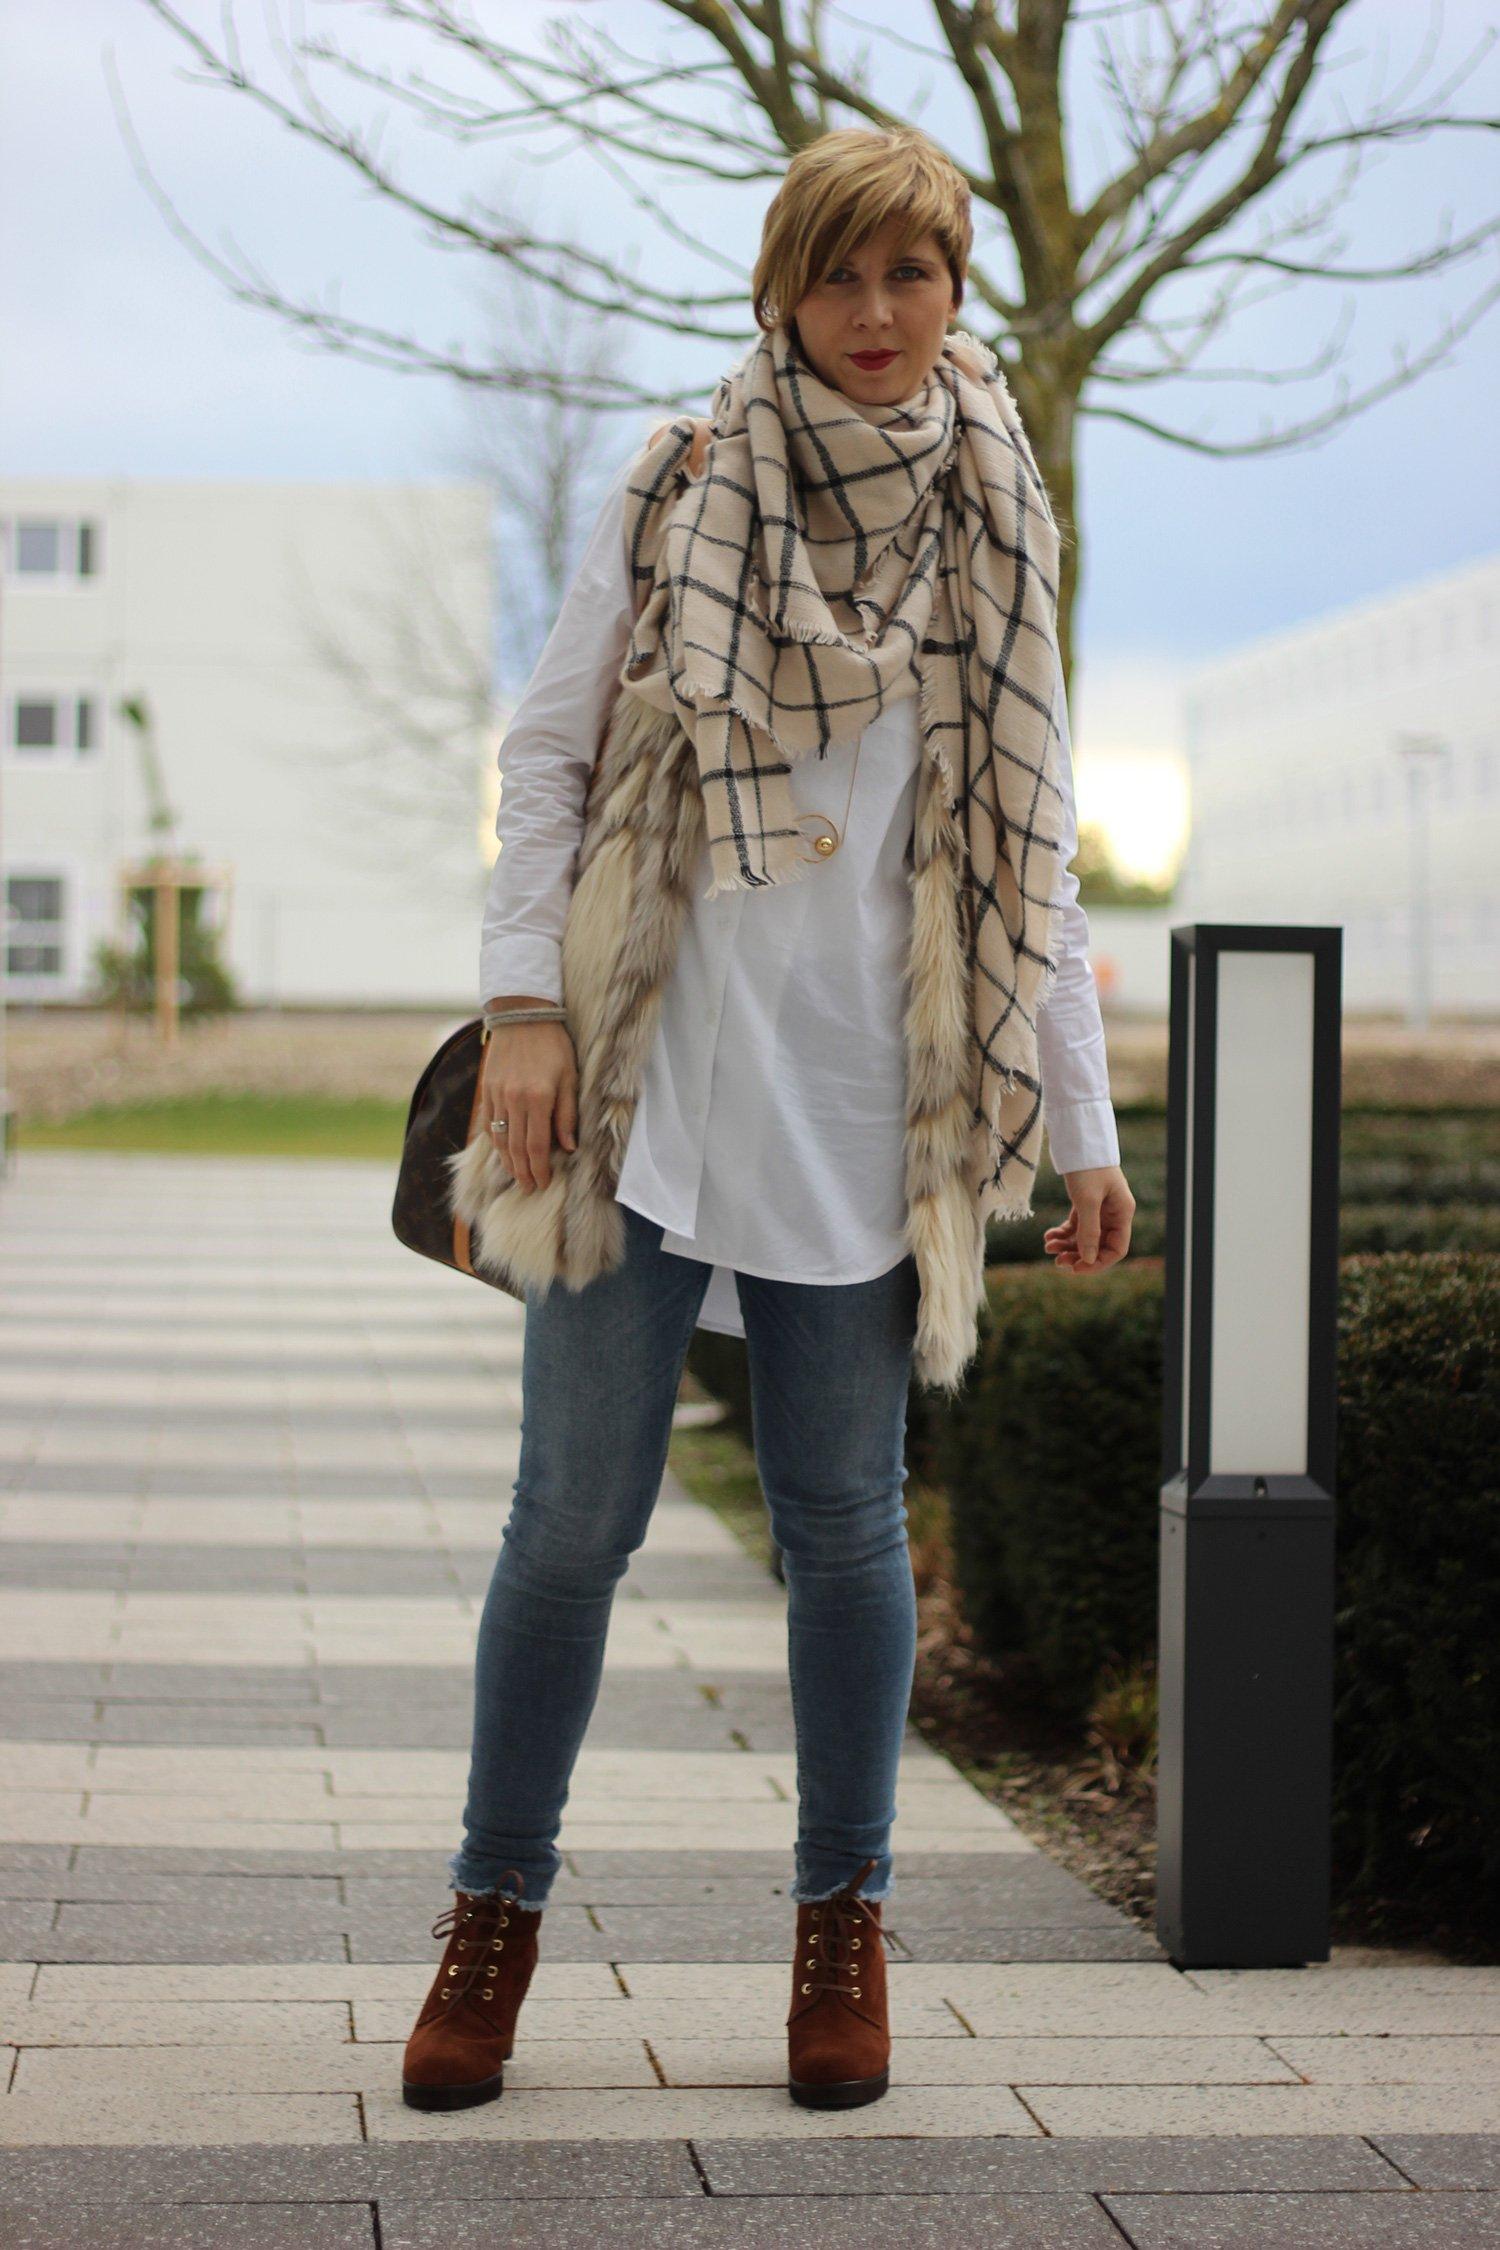 IMG_7353a-SoftRebel-Longbluse-FakefurJacke-GadeaSchuhe-allsaints-Jeans-LouisVuitton-Tasche-LieblingsladenSchal-Goldschmuck